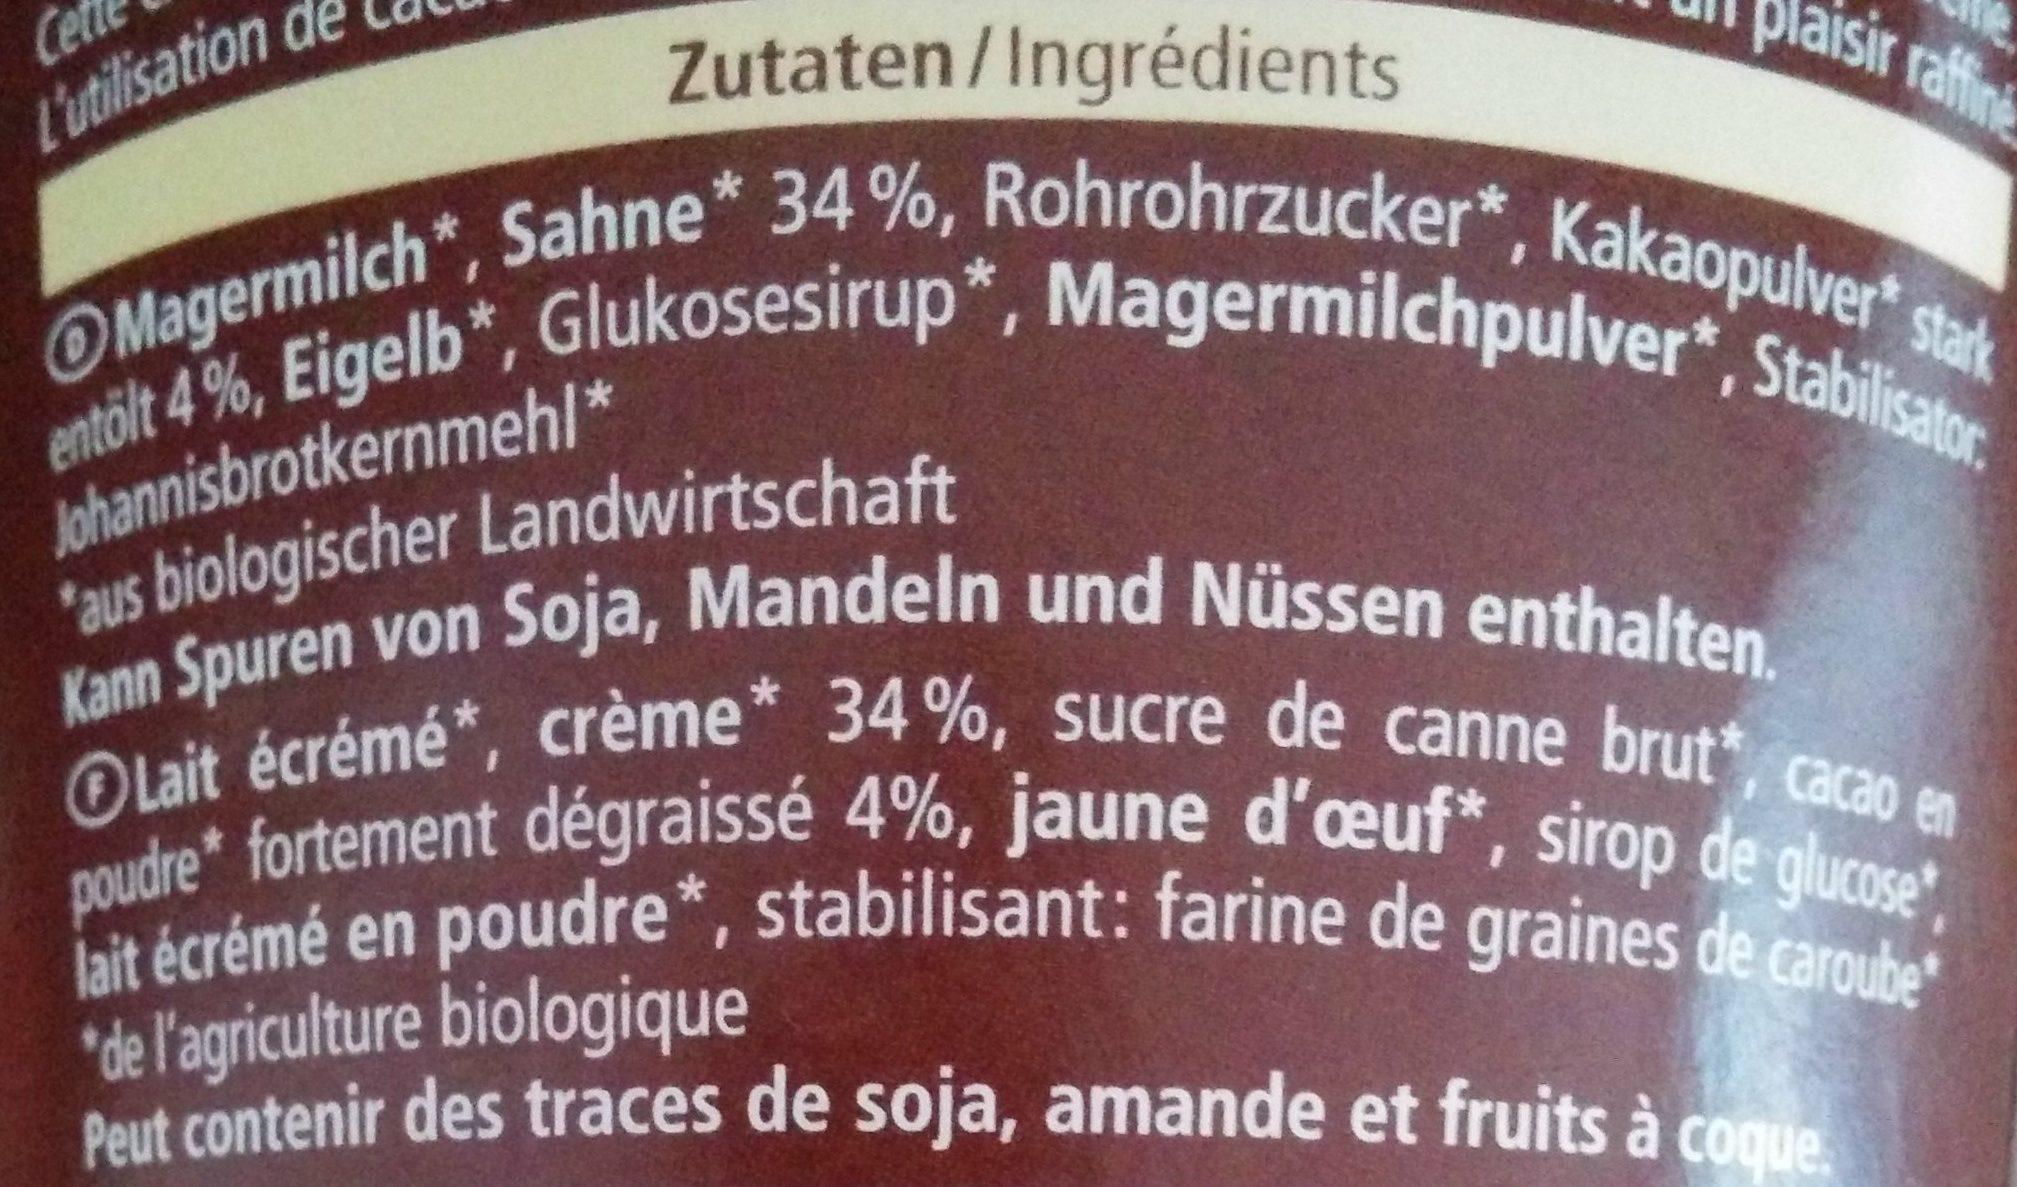 Crème glacée au chocolat - Ingredients